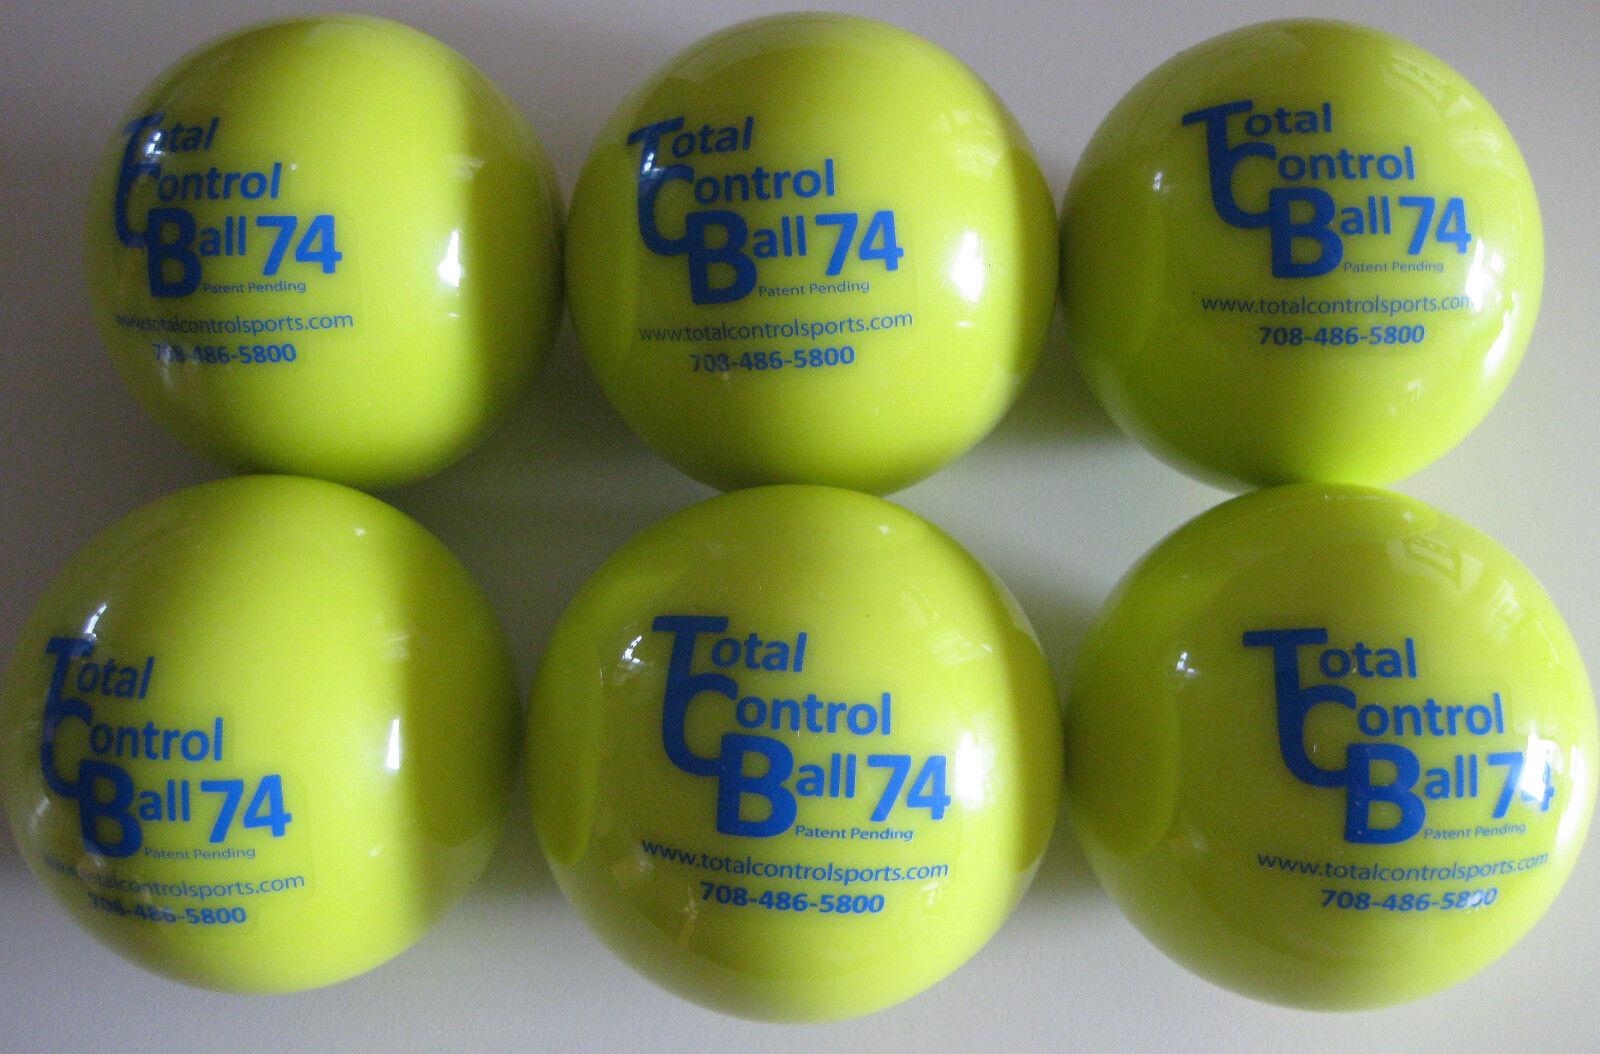 TOTAL CONTROL BALL TCB 74 Baseball Weighted Training Hitting Batting Aid  6 PK